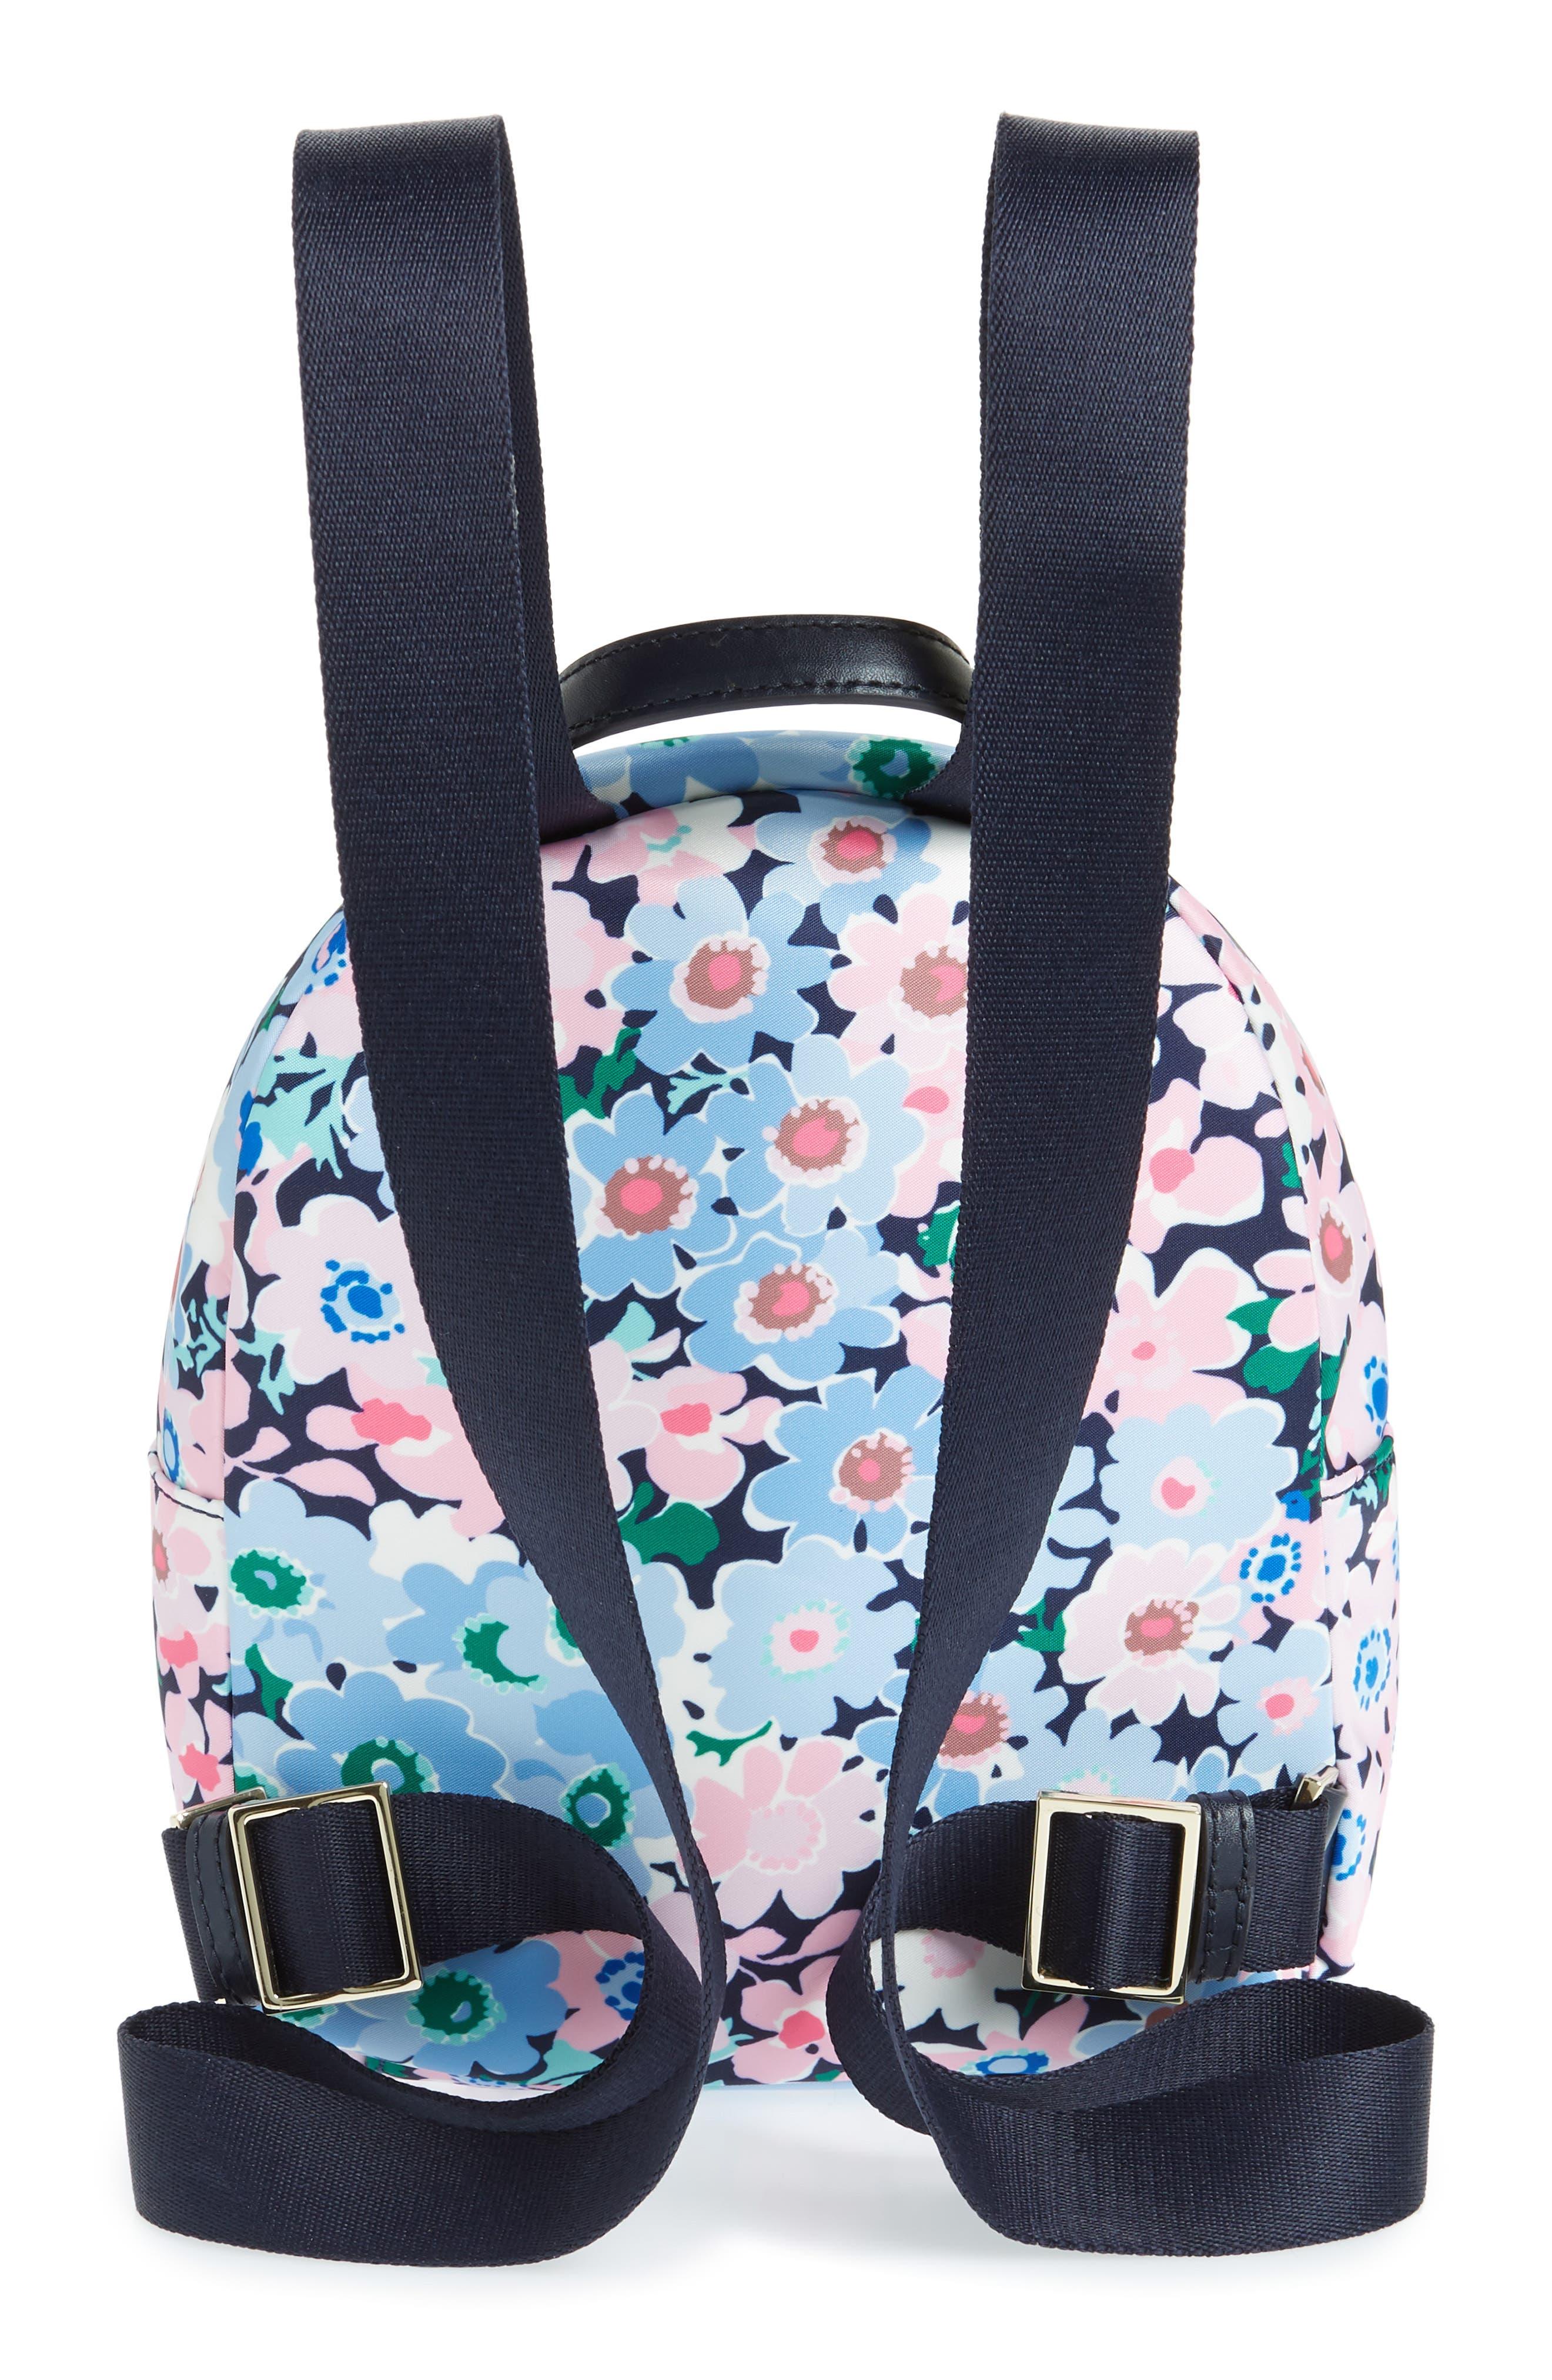 watson lane - daisy garden small hartley backpack,                             Alternate thumbnail 3, color,                             Blue Multi